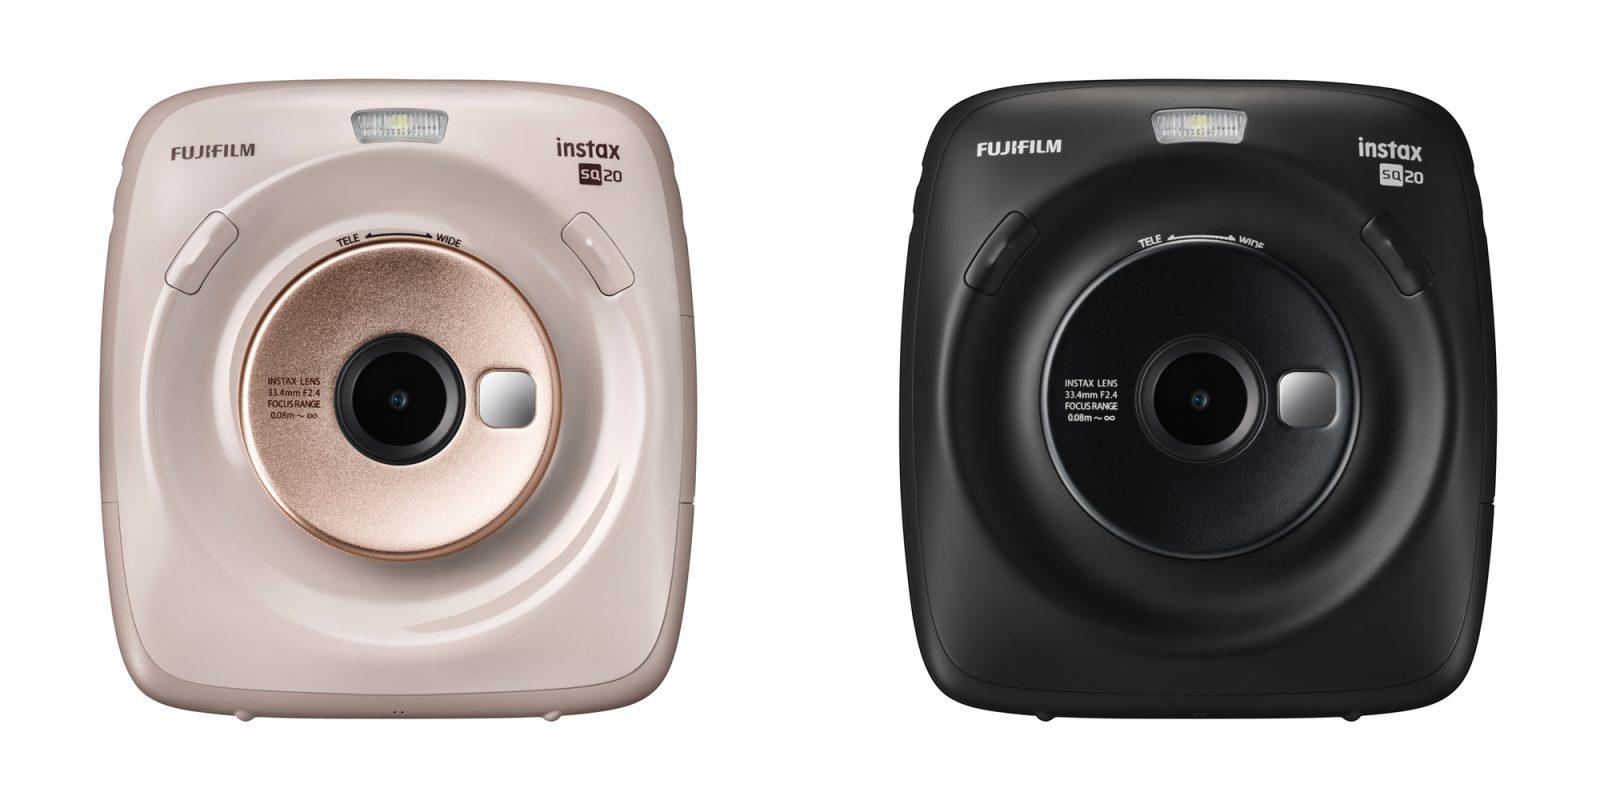 Fujifilm's latest instant camera wraps video recording into